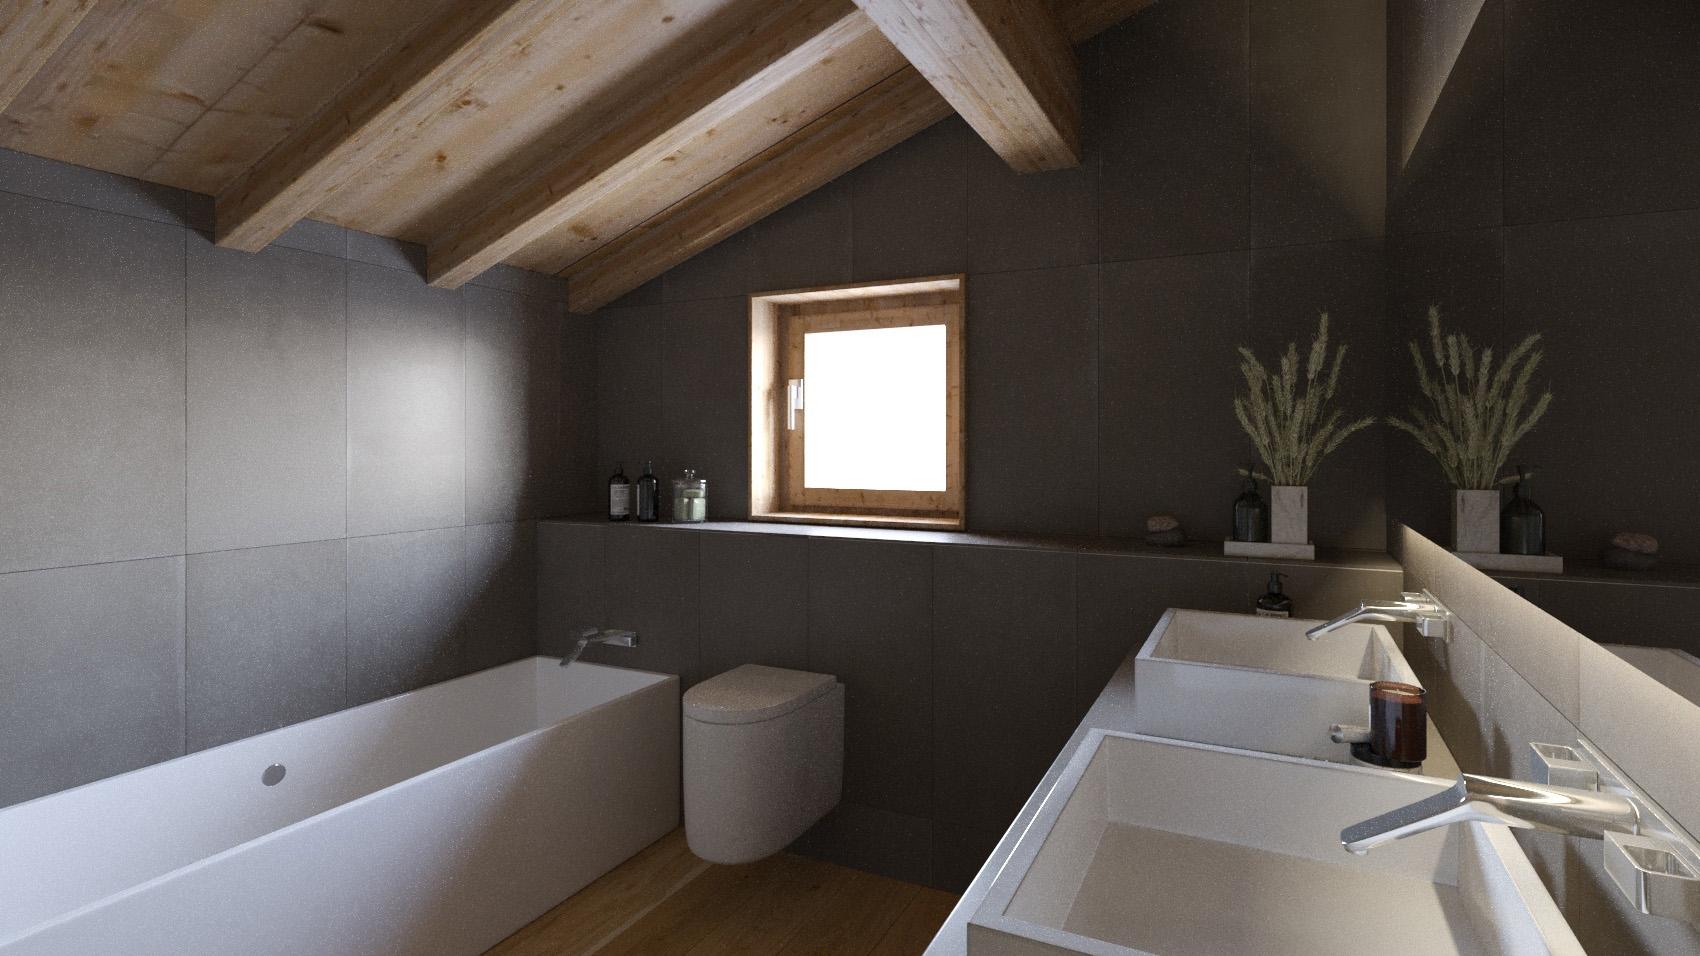 Les 3 Fontaines Apartments, France